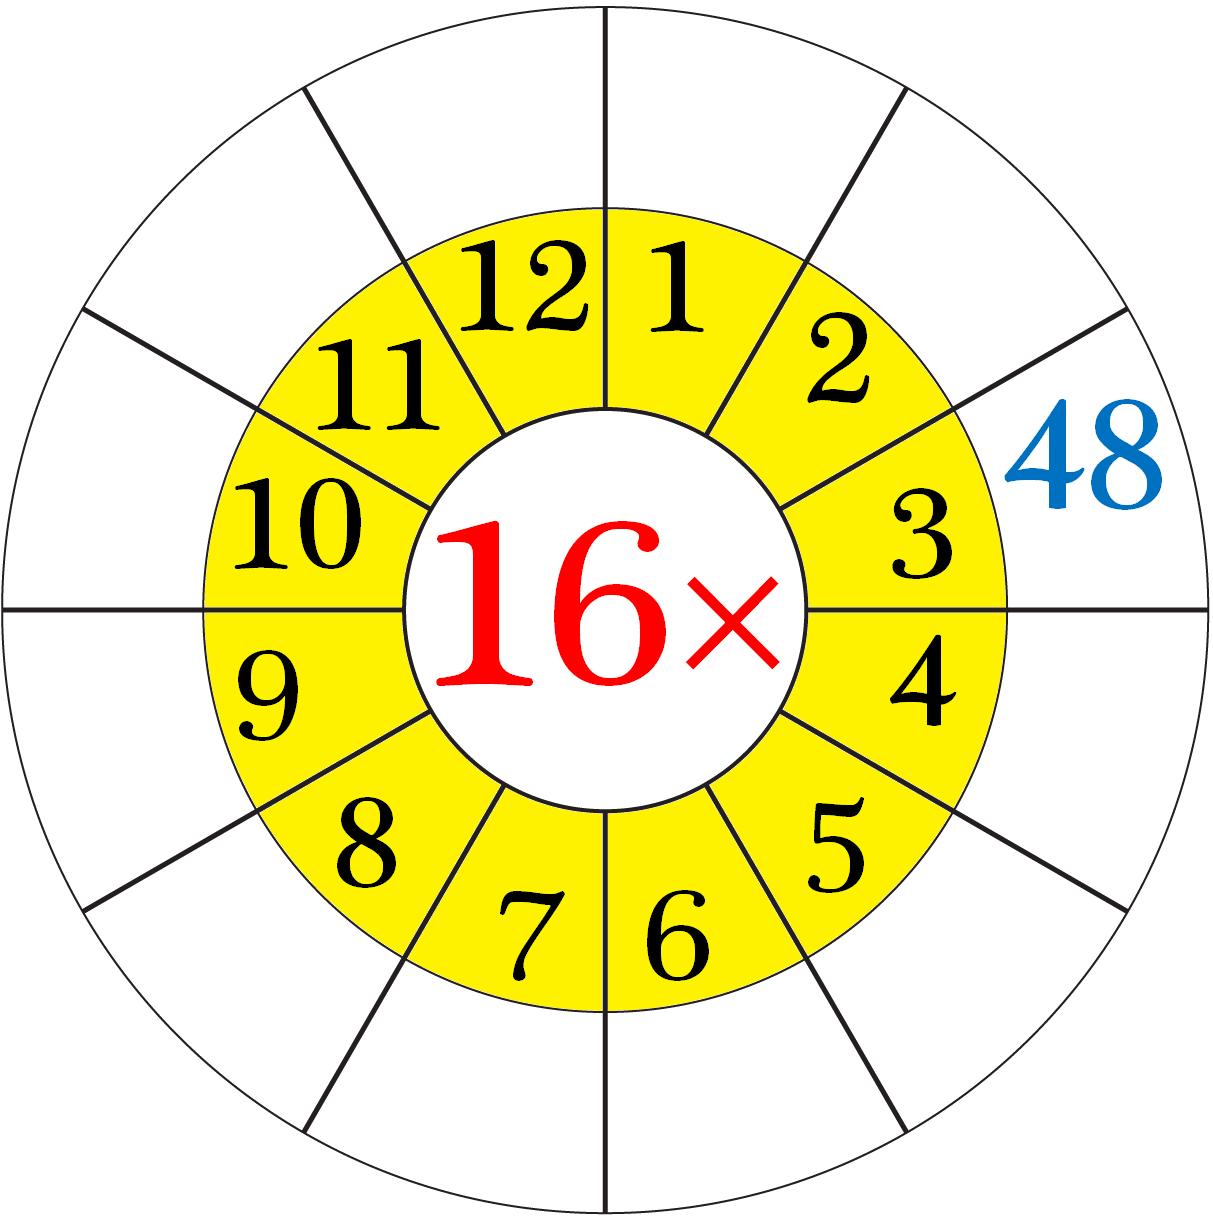 Worksheet on Multiplication Table of 16